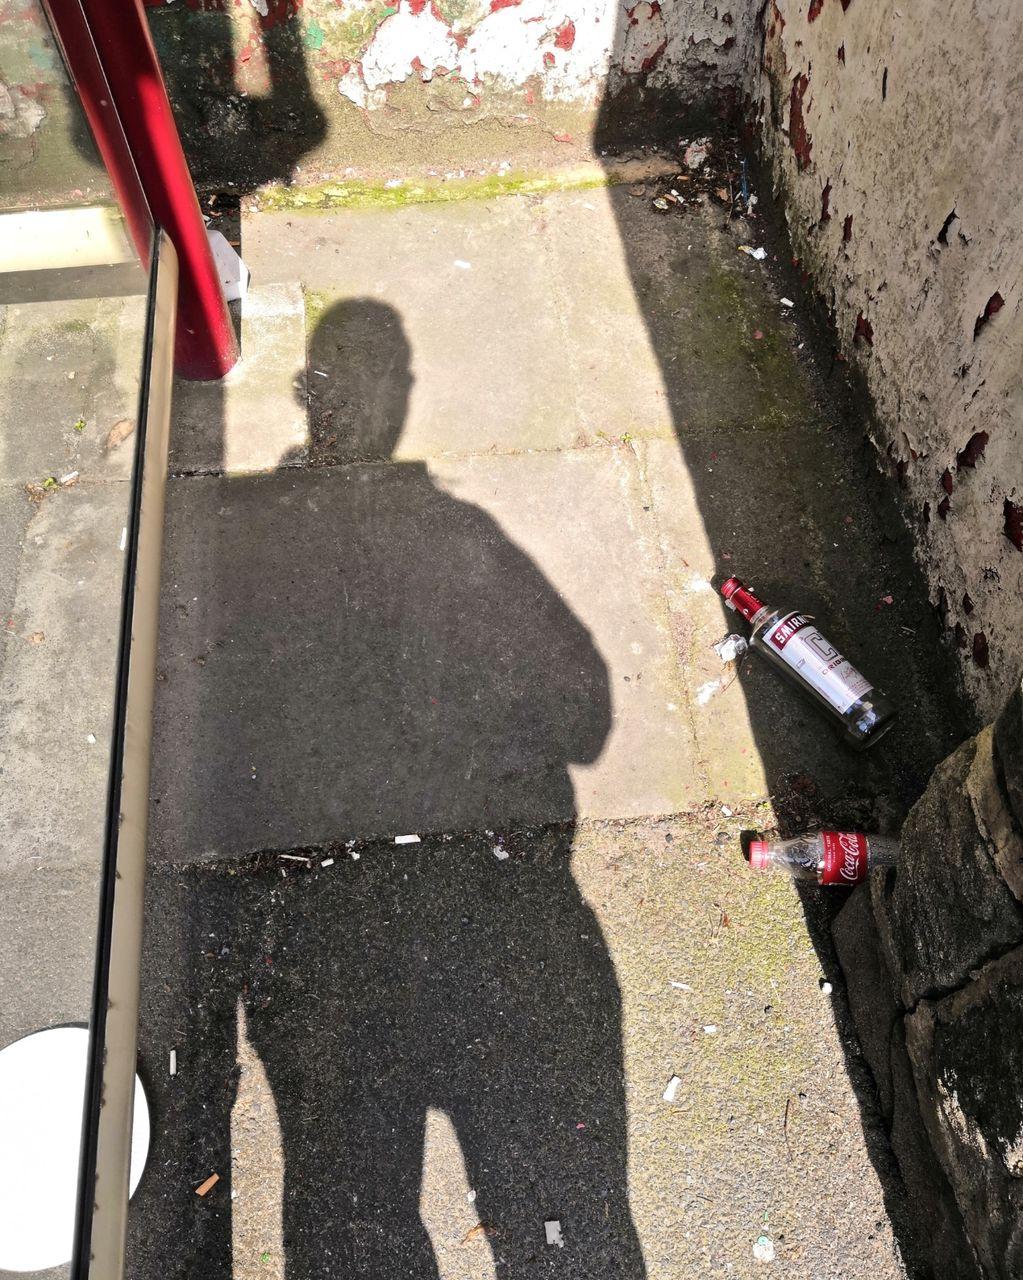 Self Portrait With Vodka and Coke 2019